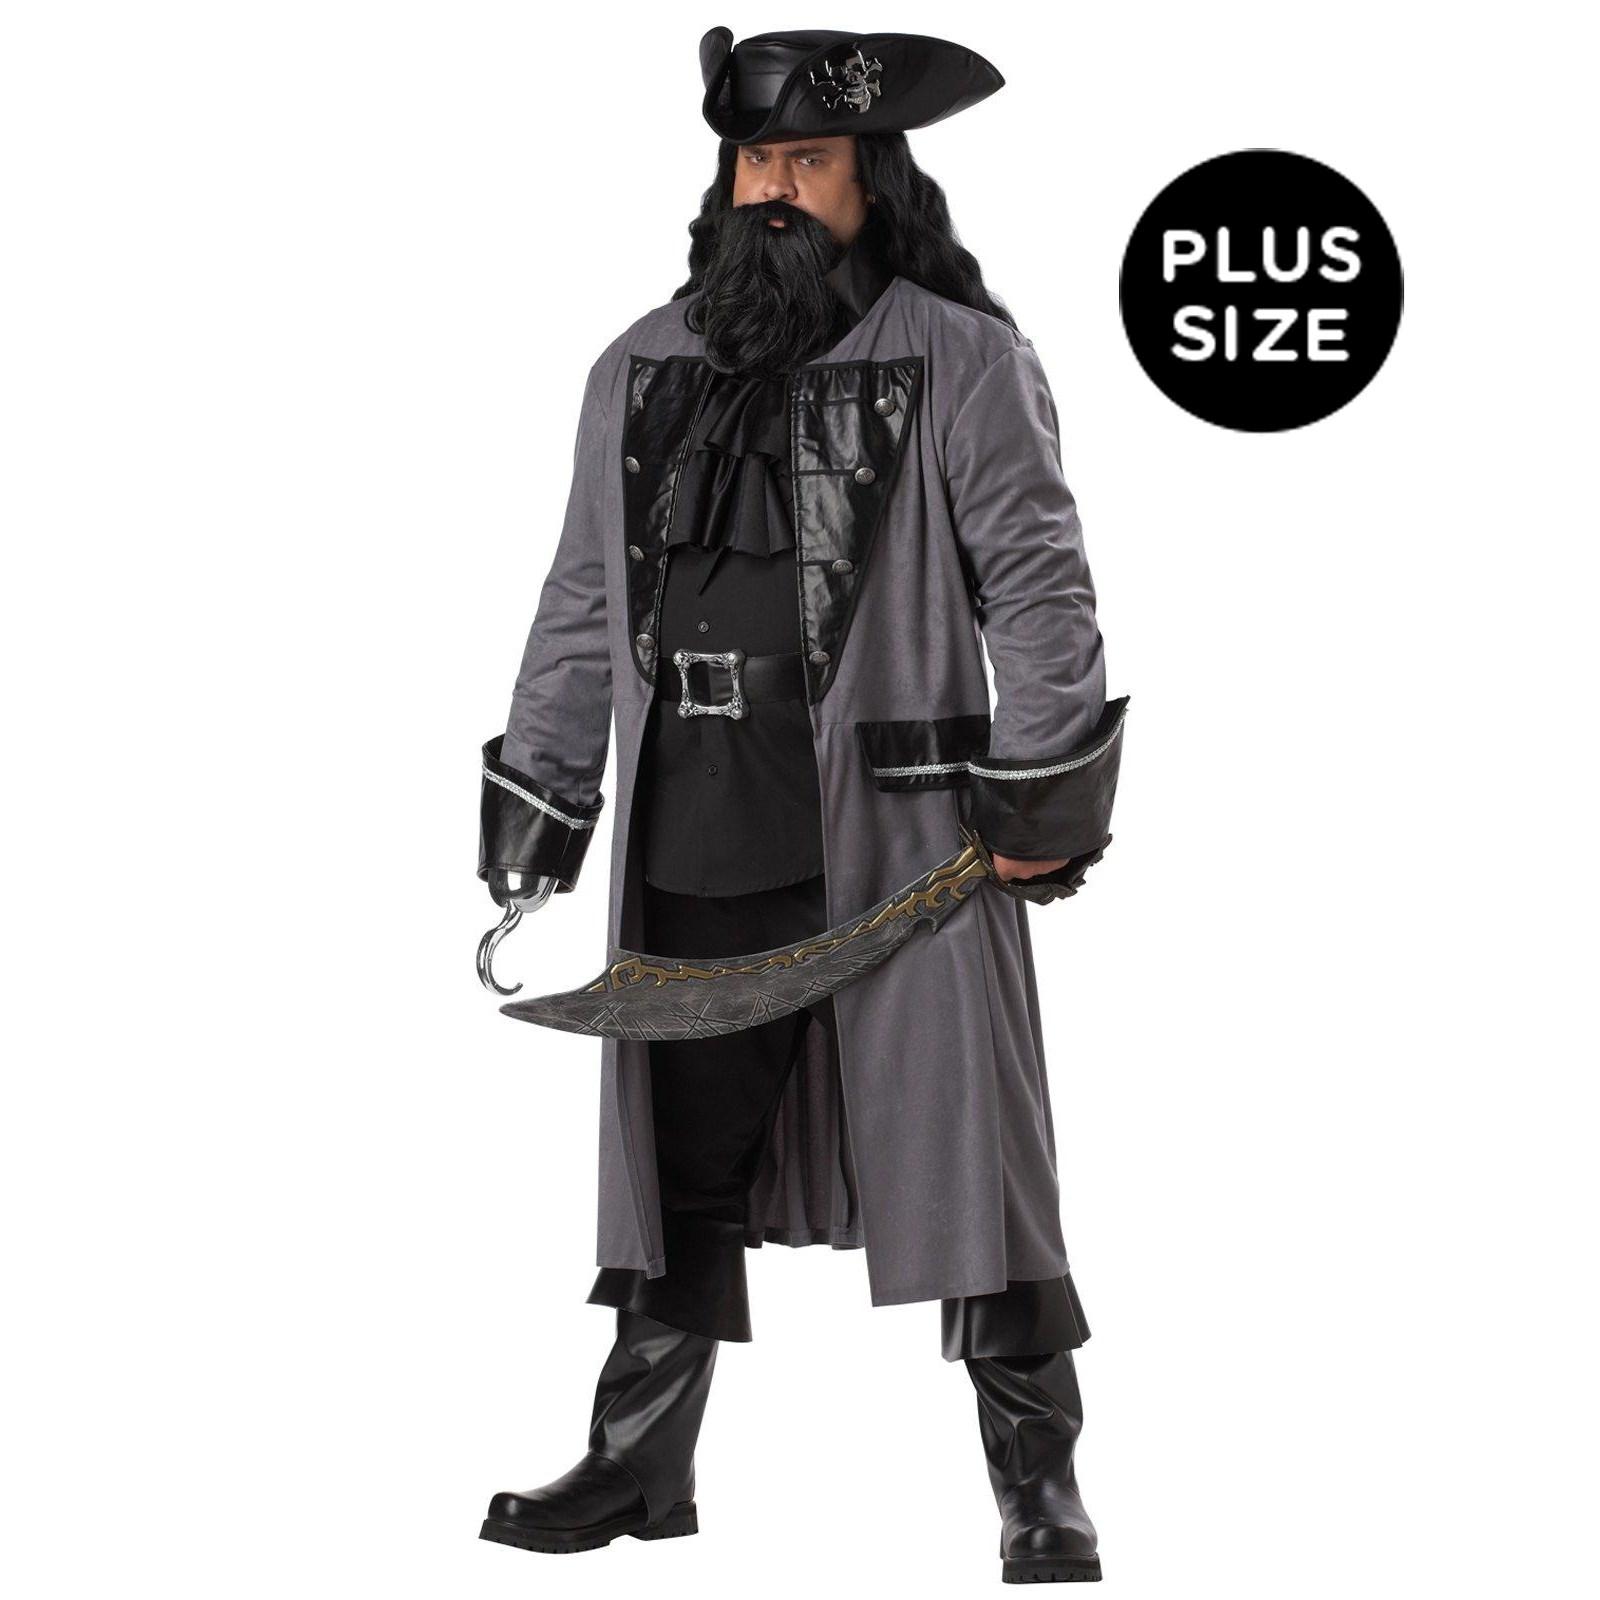 Image of Blackbeard the Pirate Adult Plus Costume